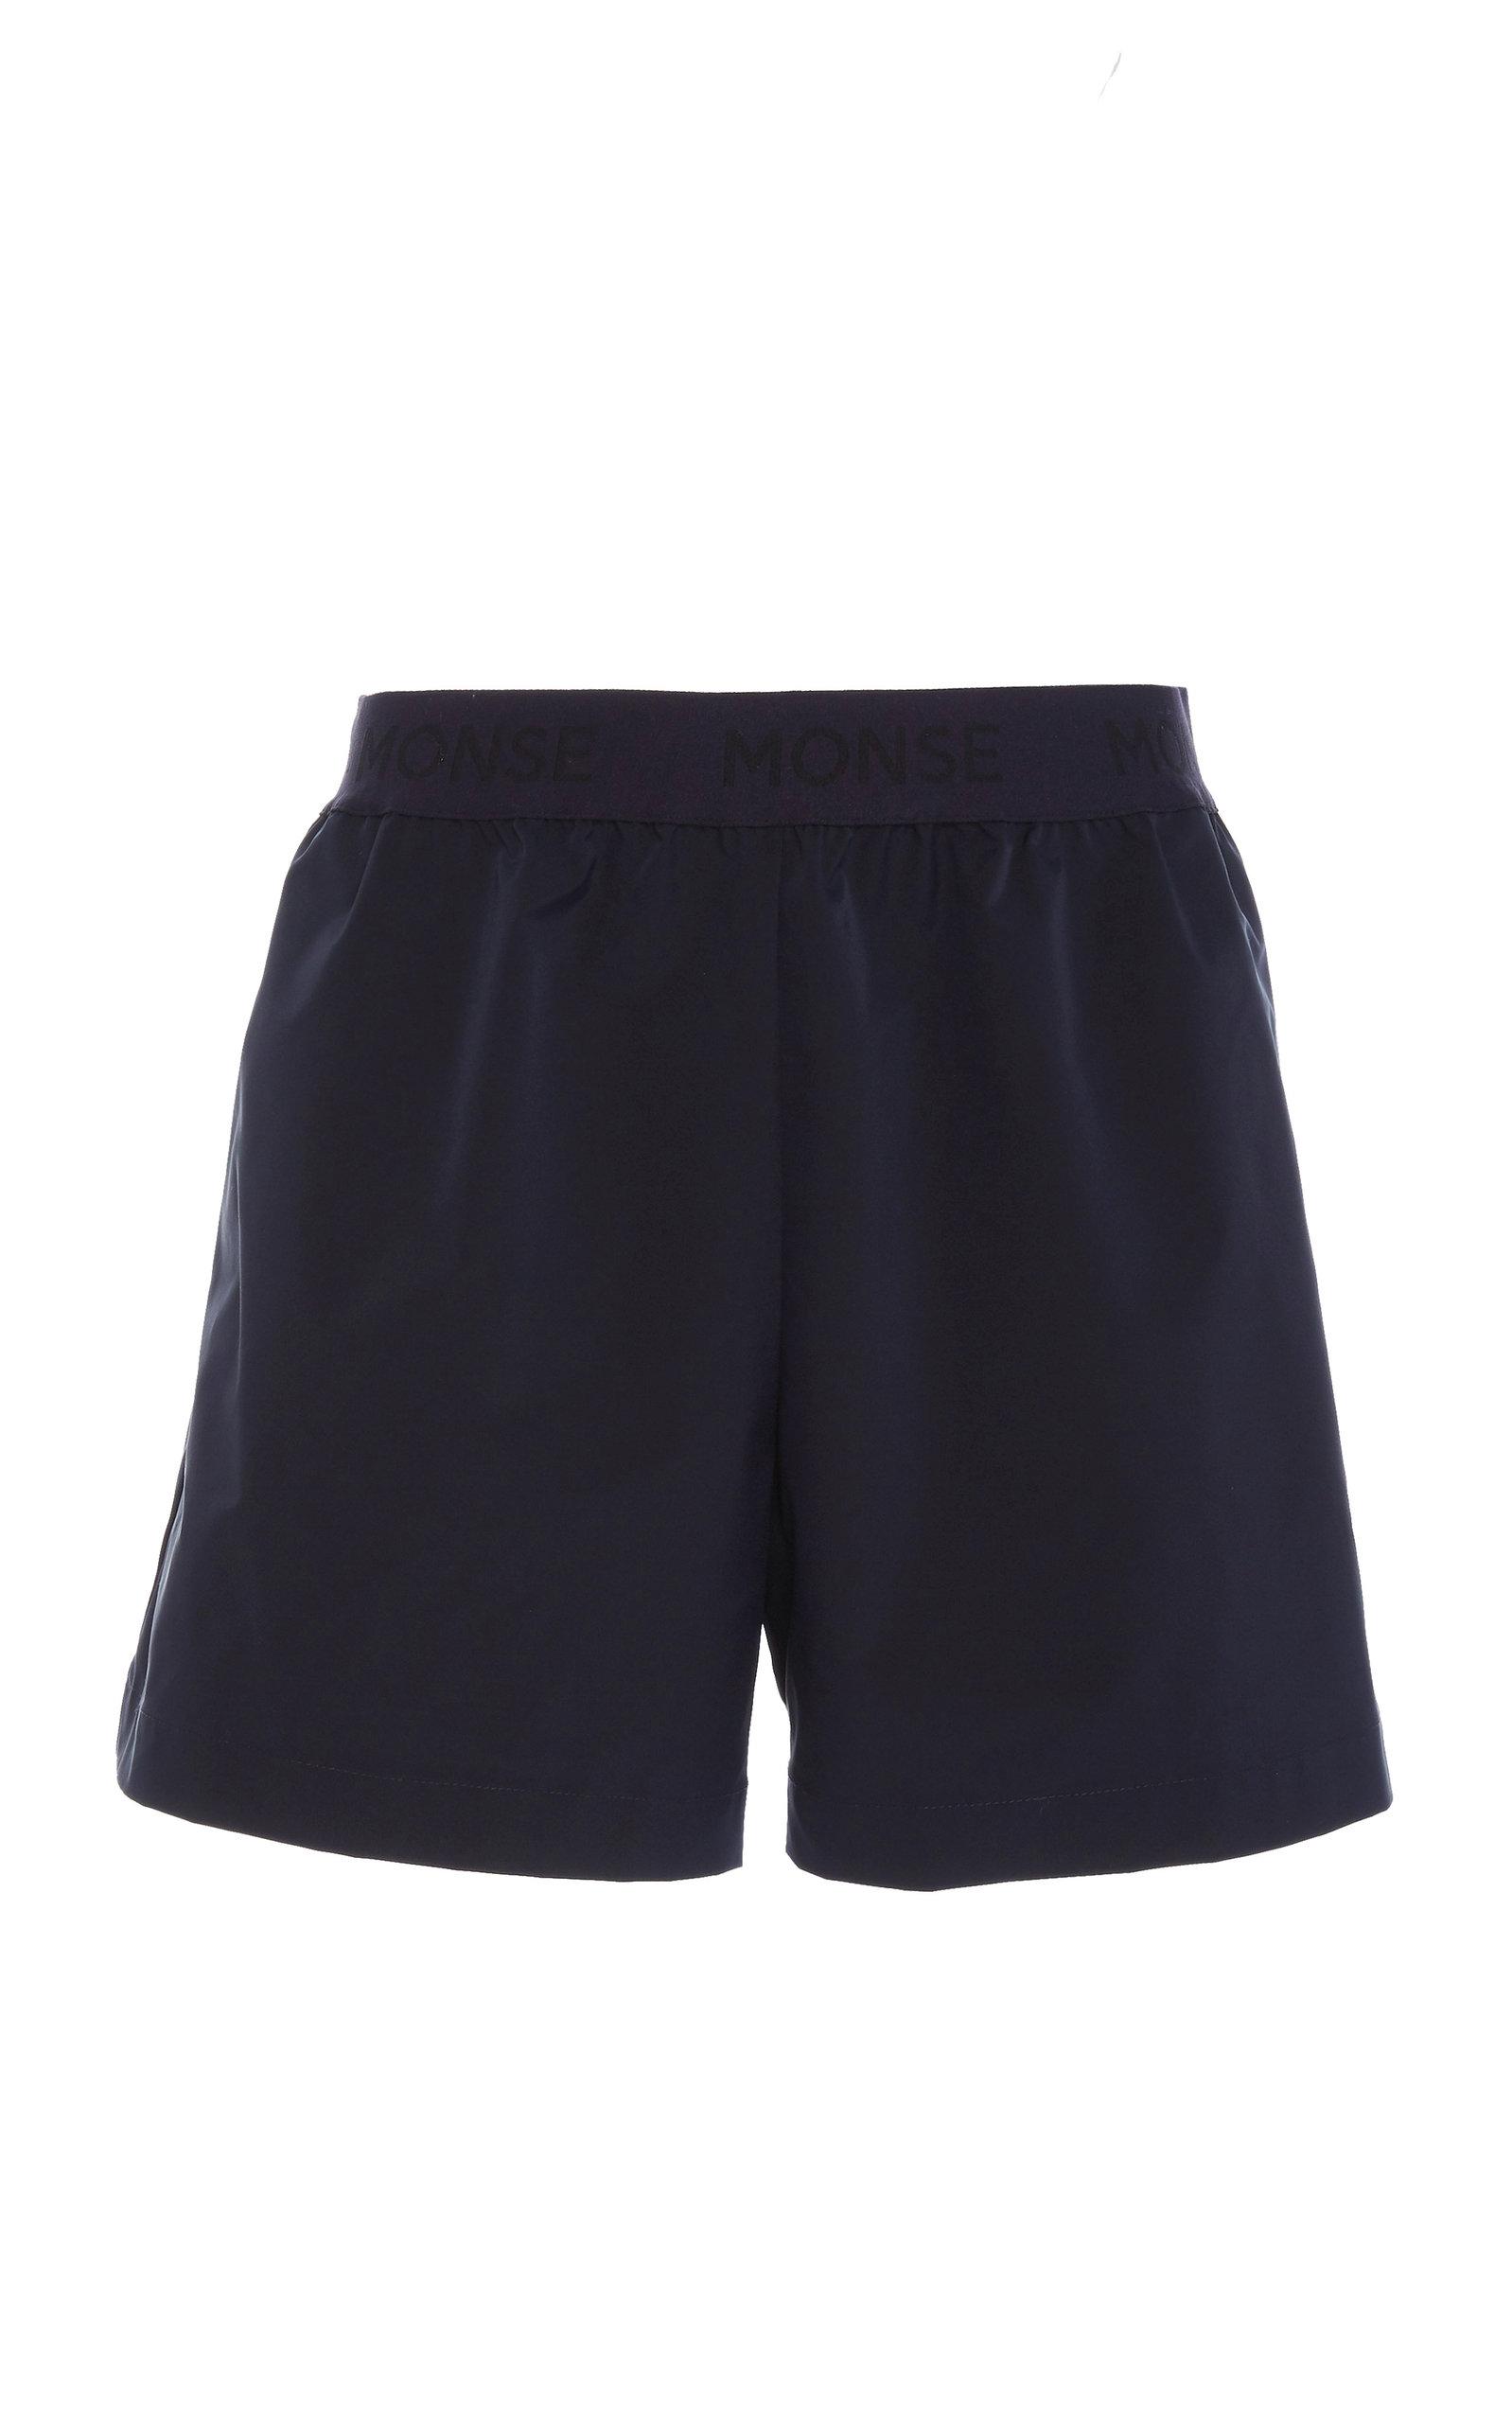 cintura Jil cinturón Shorts de Sander verde con 6q5Rzw